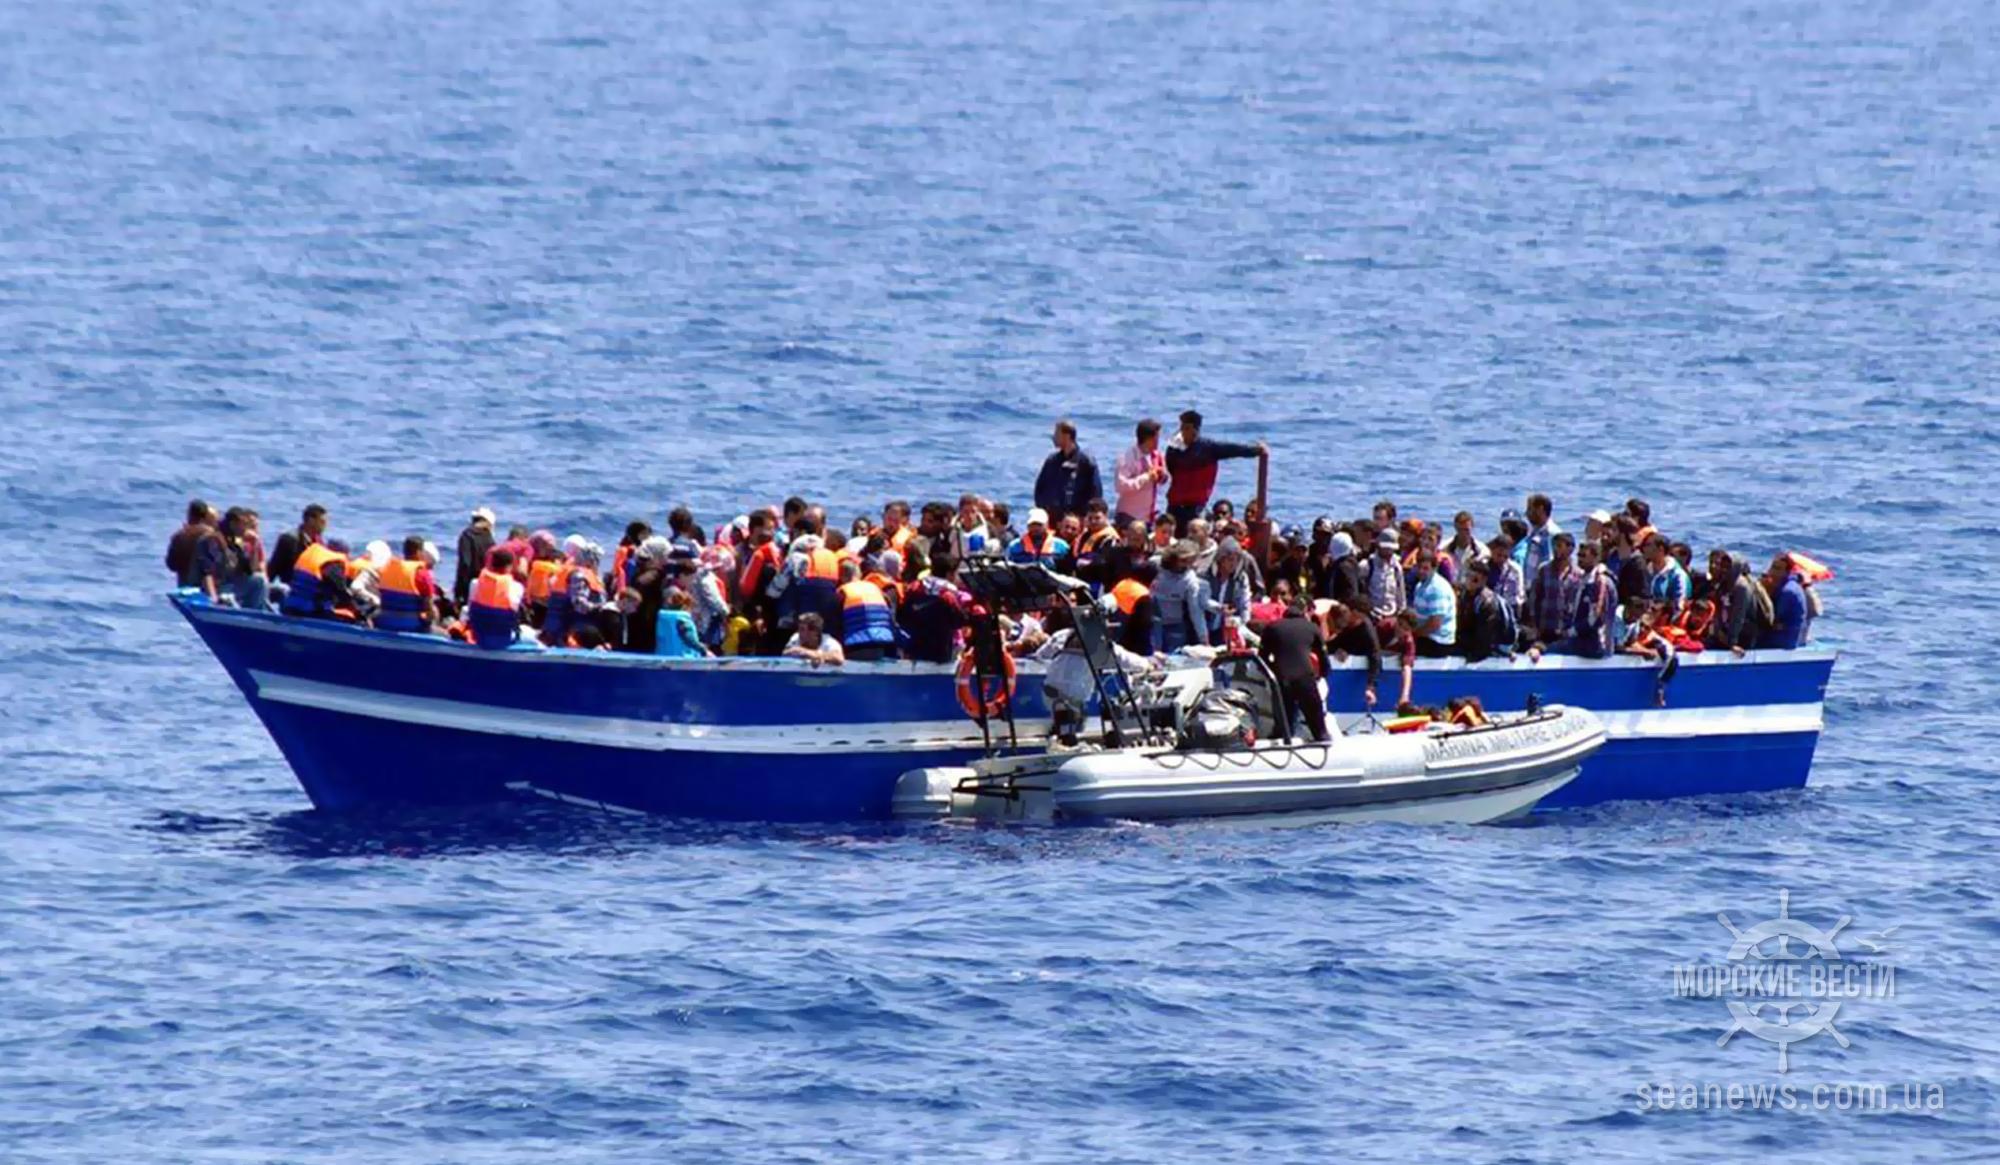 У берегов турецкого Измира задержано судно с 276 мигрантами